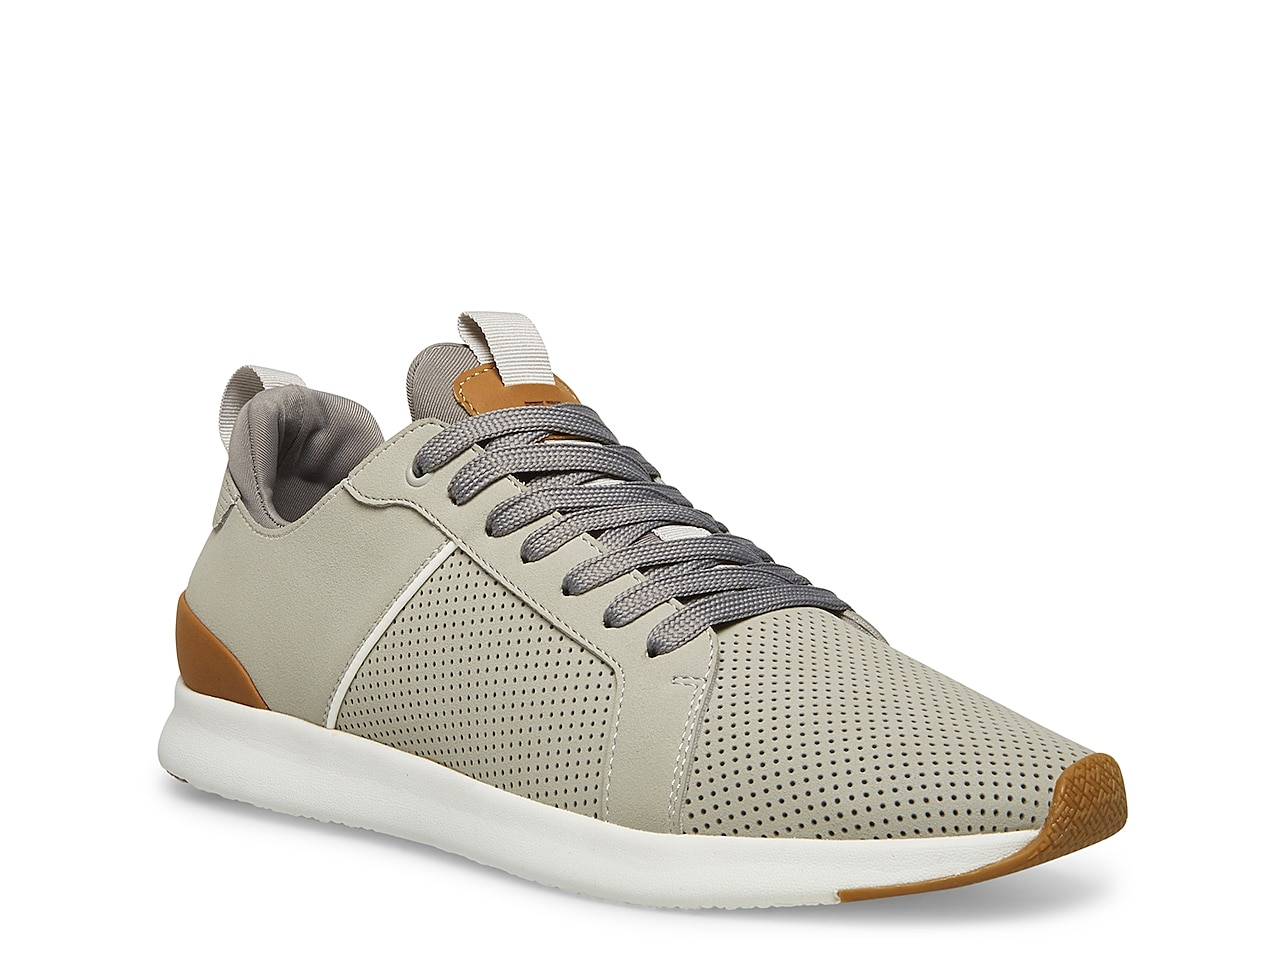 Steve Madden P-Scoop Oxford Sneaker